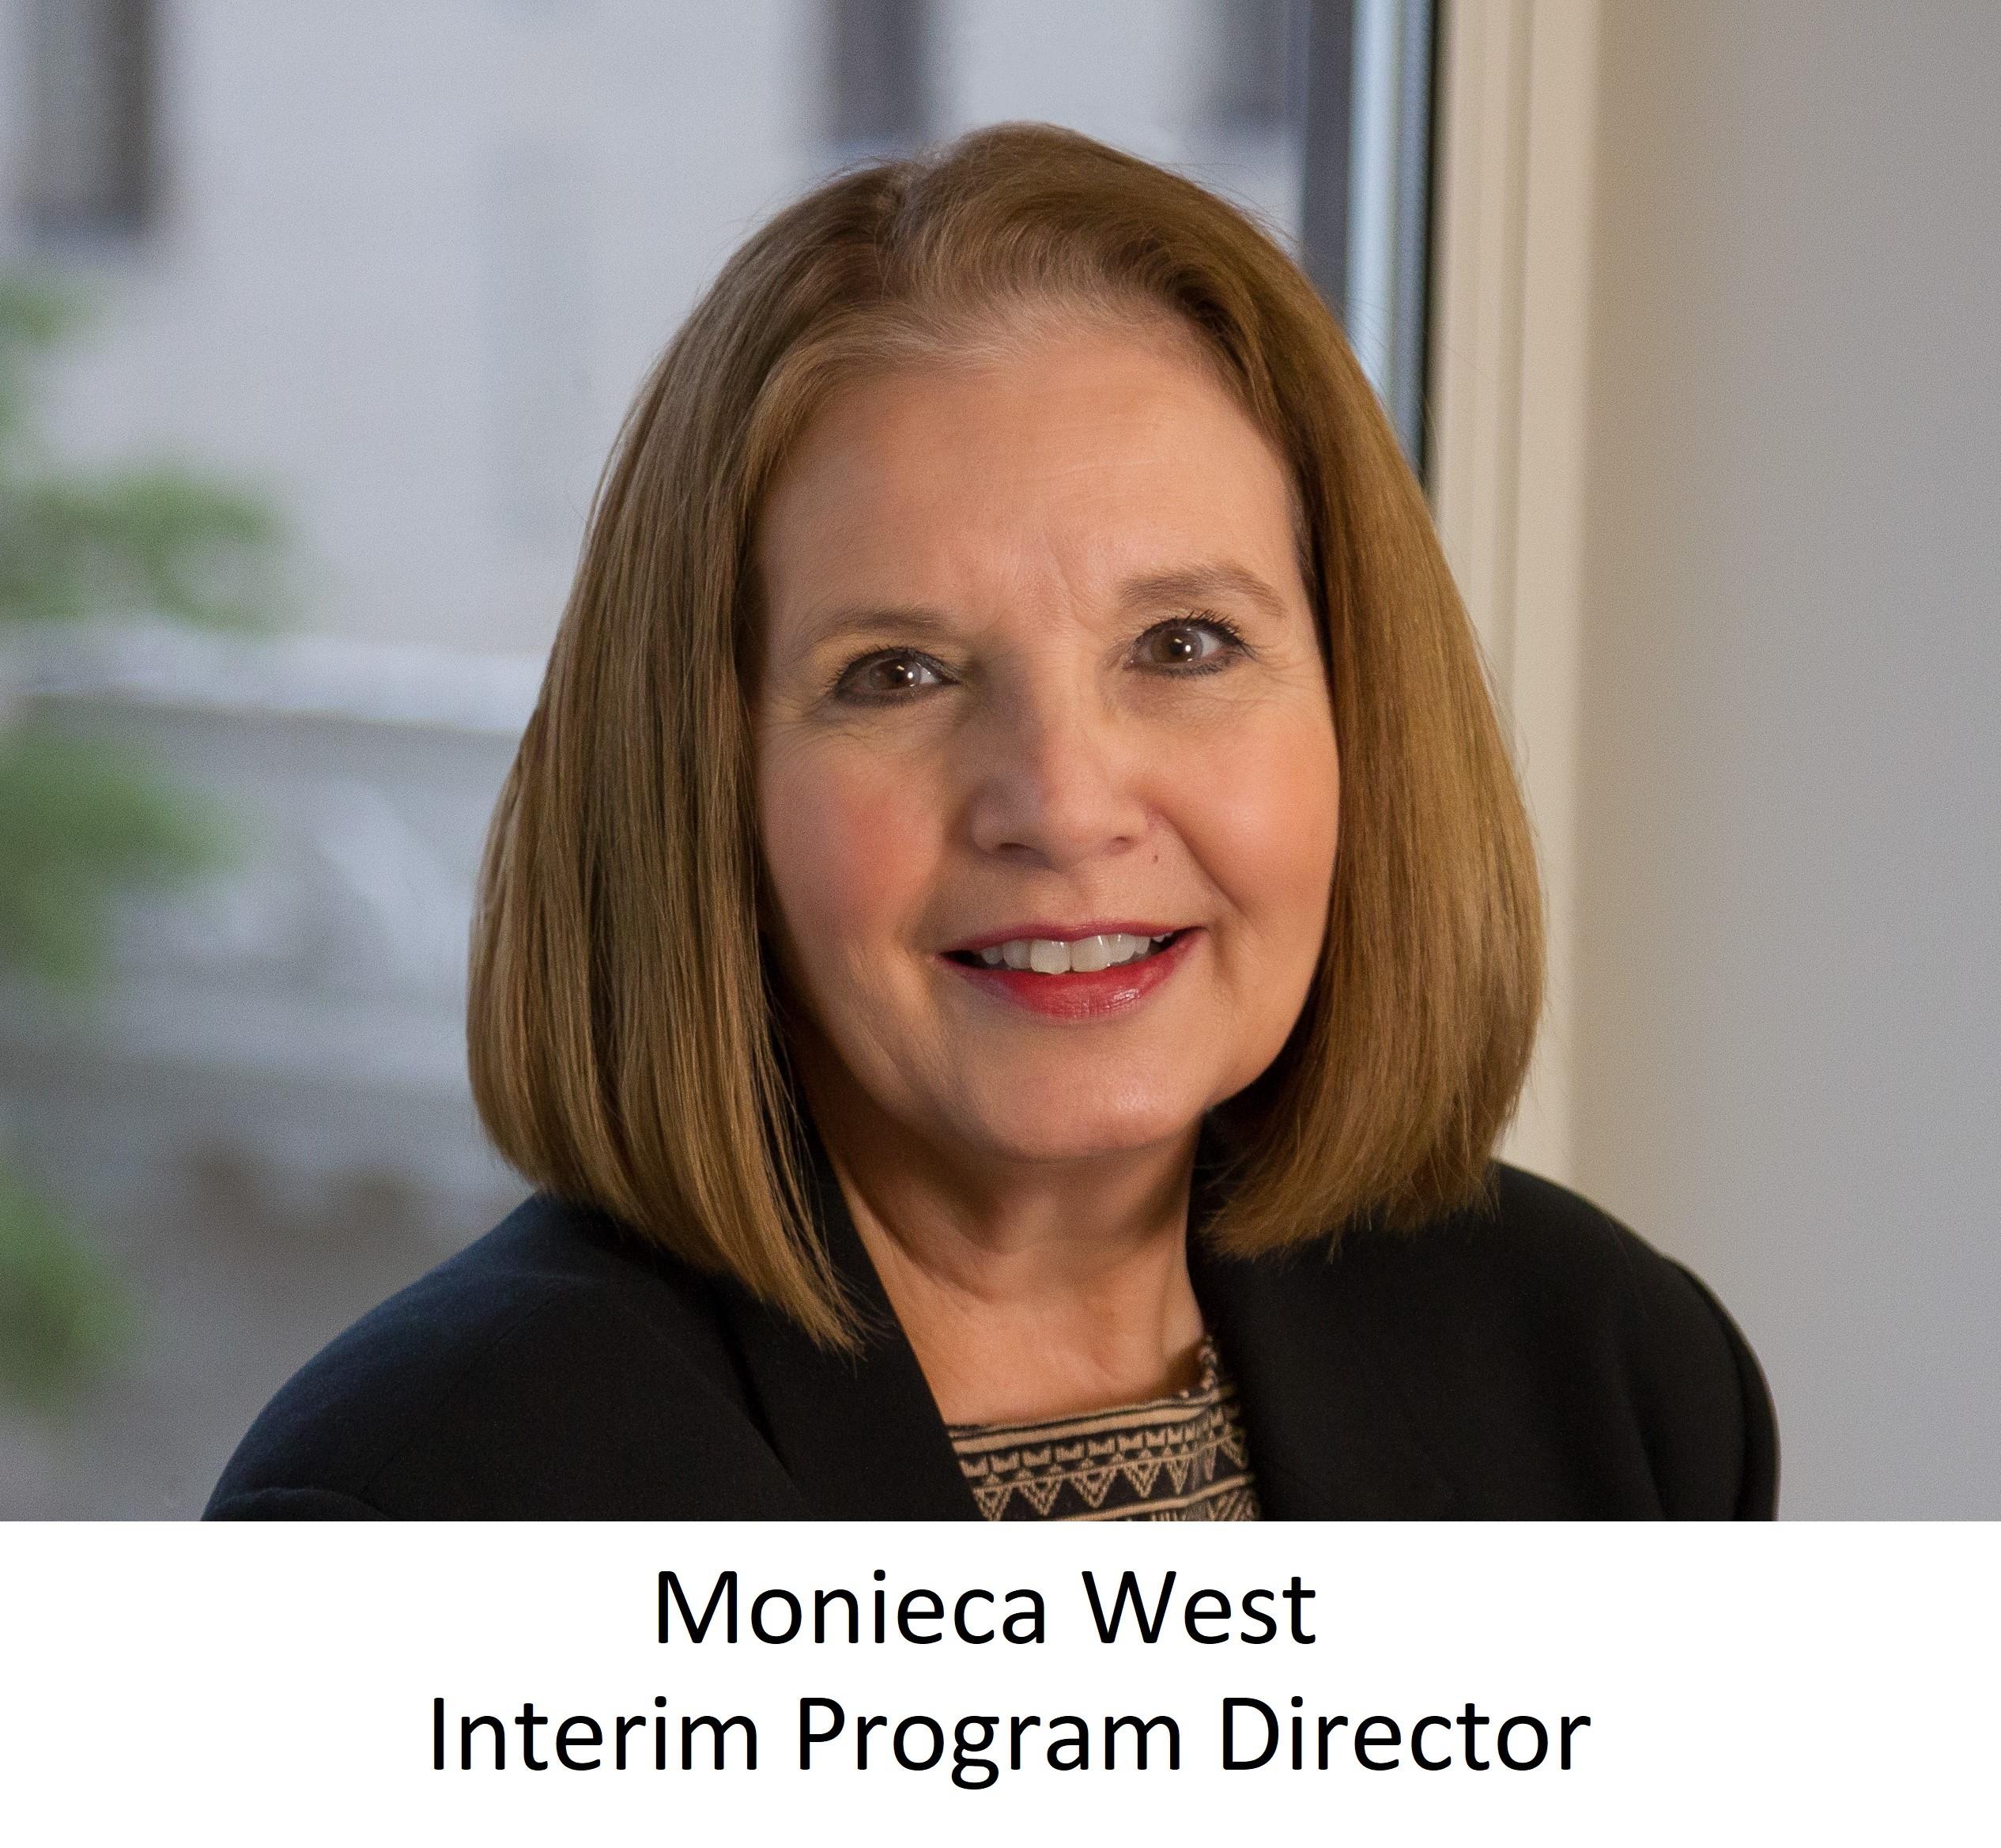 Monieca West, Interim Program Director